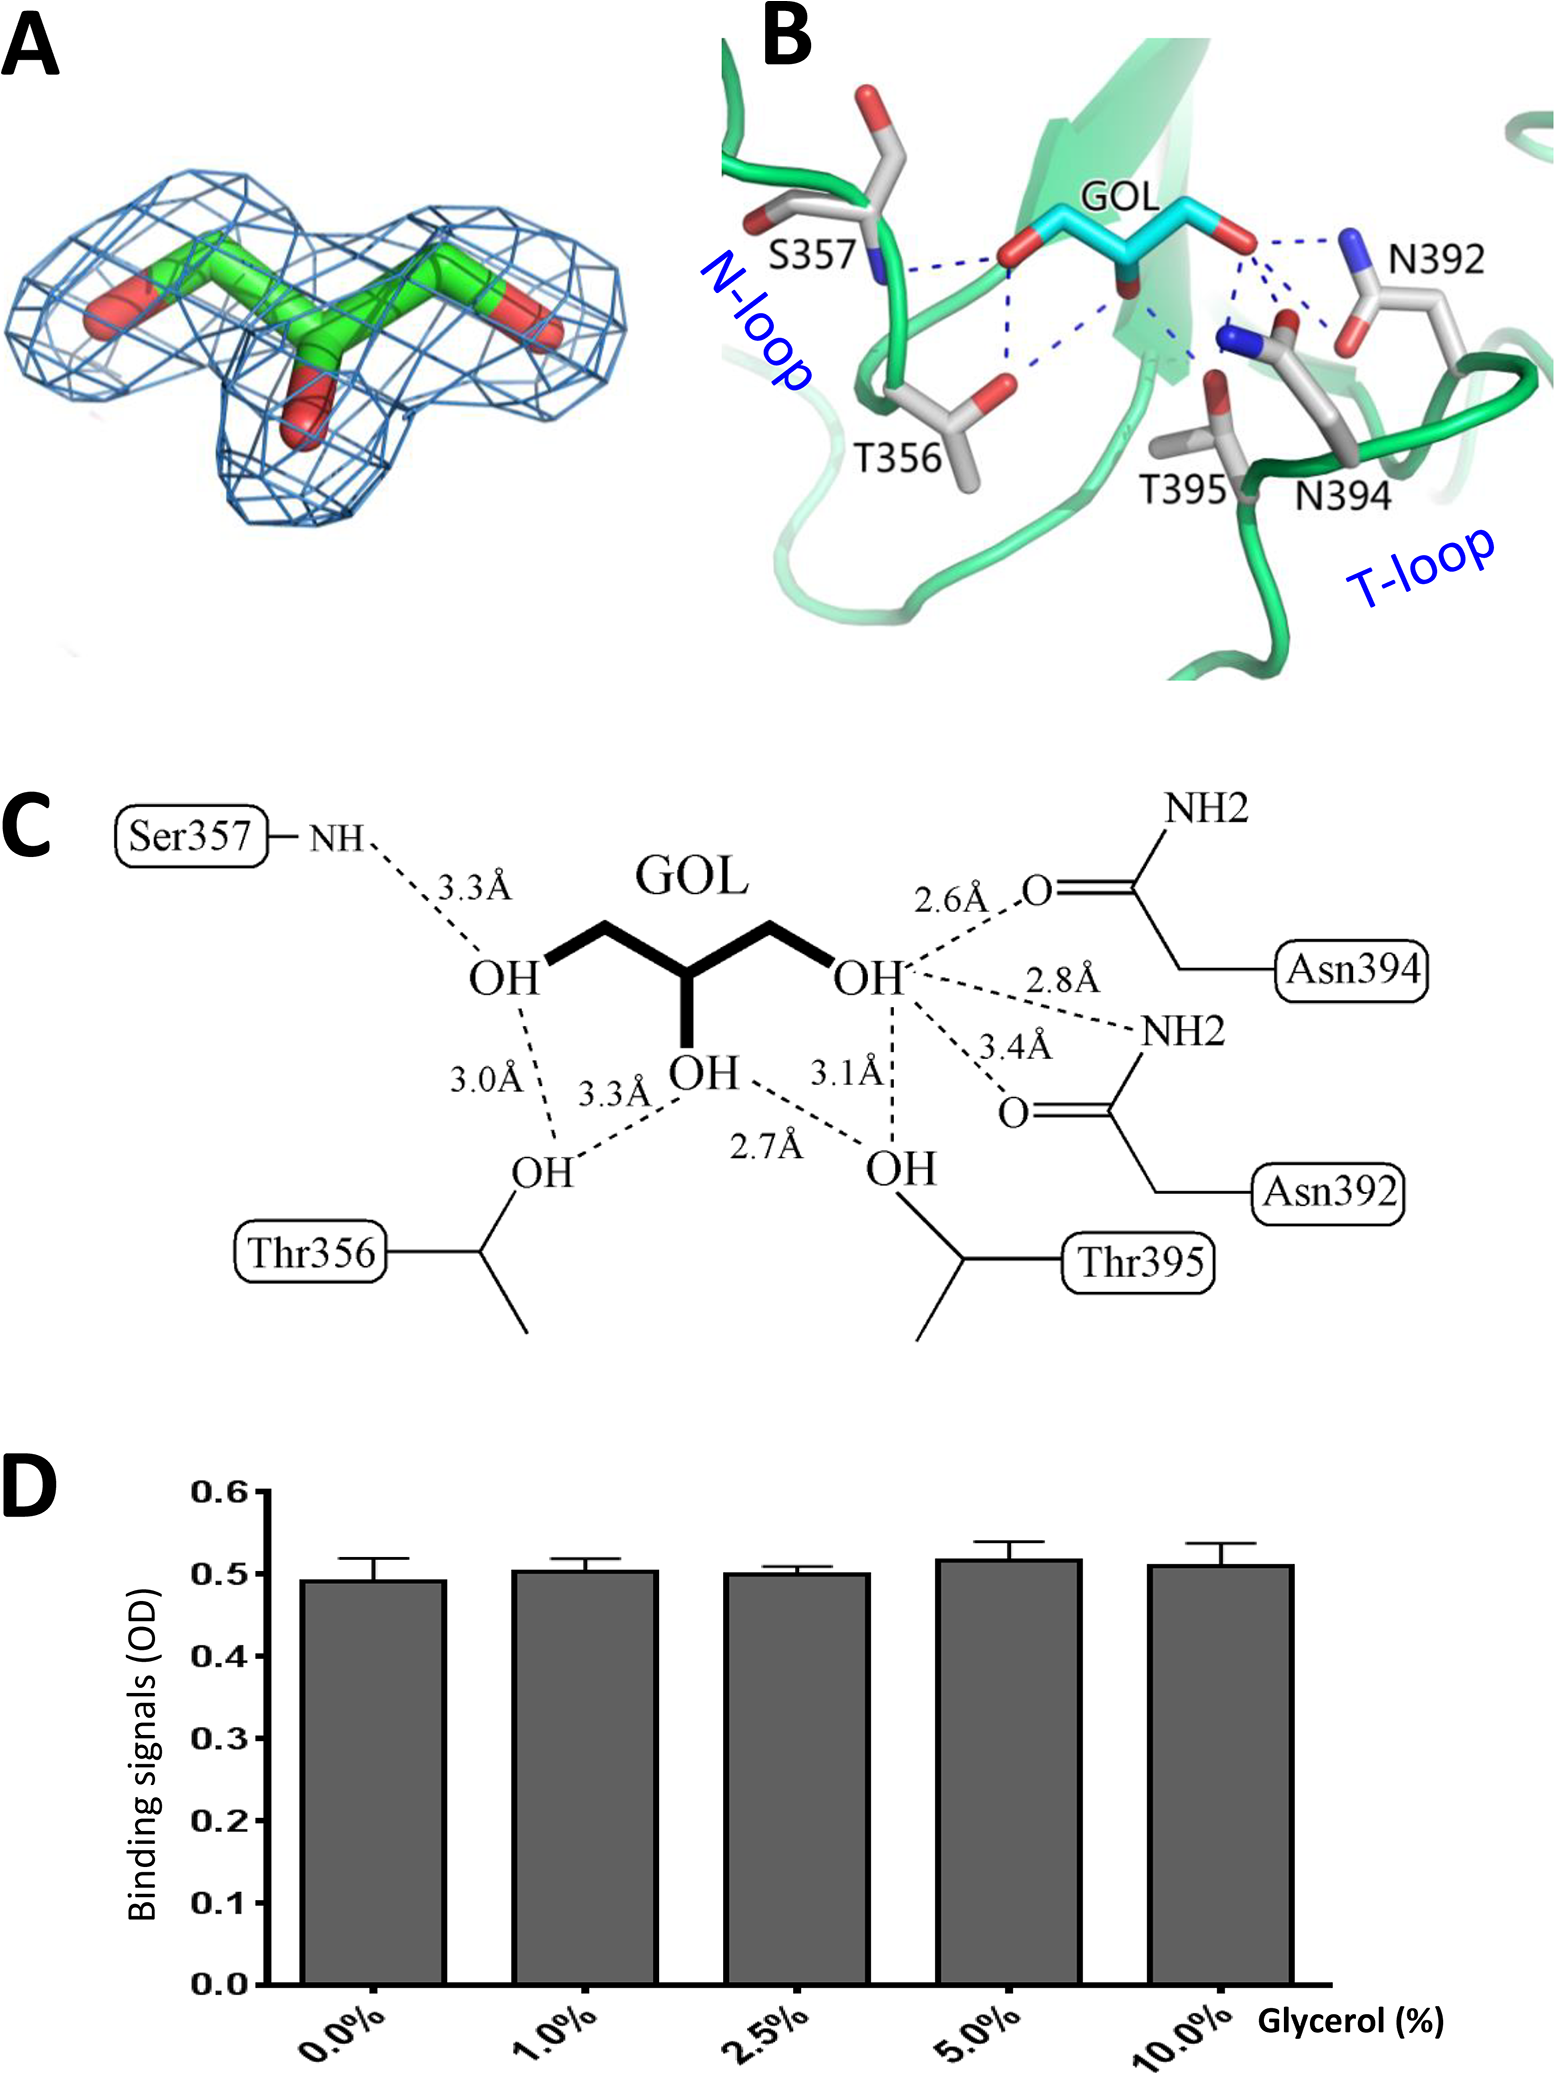 Glycerol binds the HBGA binding interface of OIF virus.